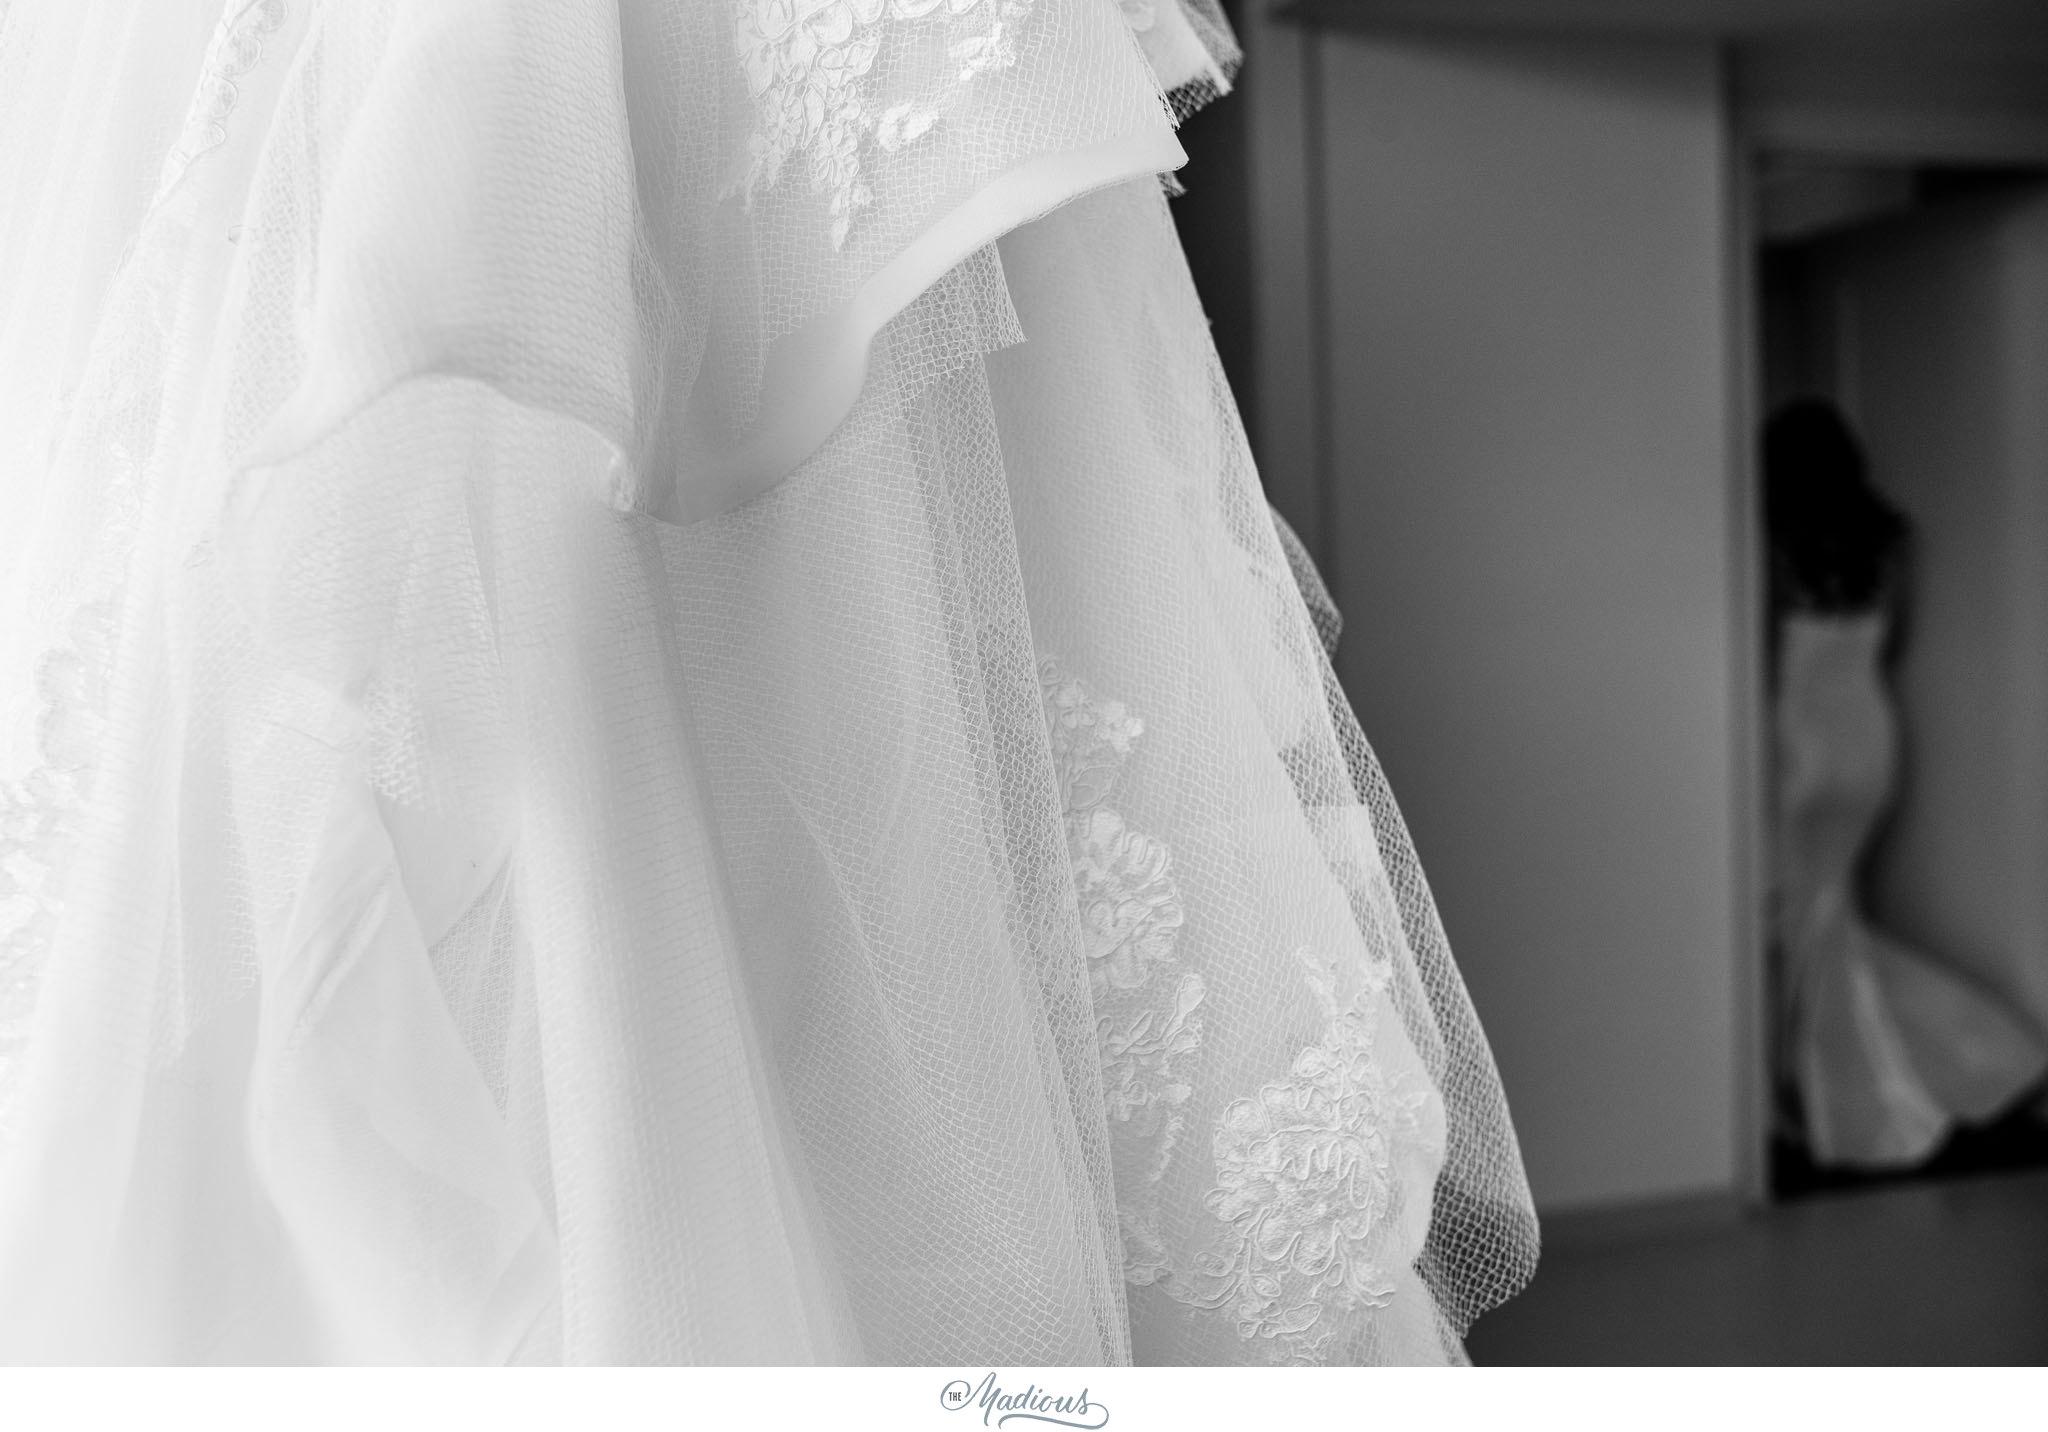 nmwa+wedding,+women+in+the+arts+wedding,+ethiopian+wedding,+dc+wedding+0008.jpg